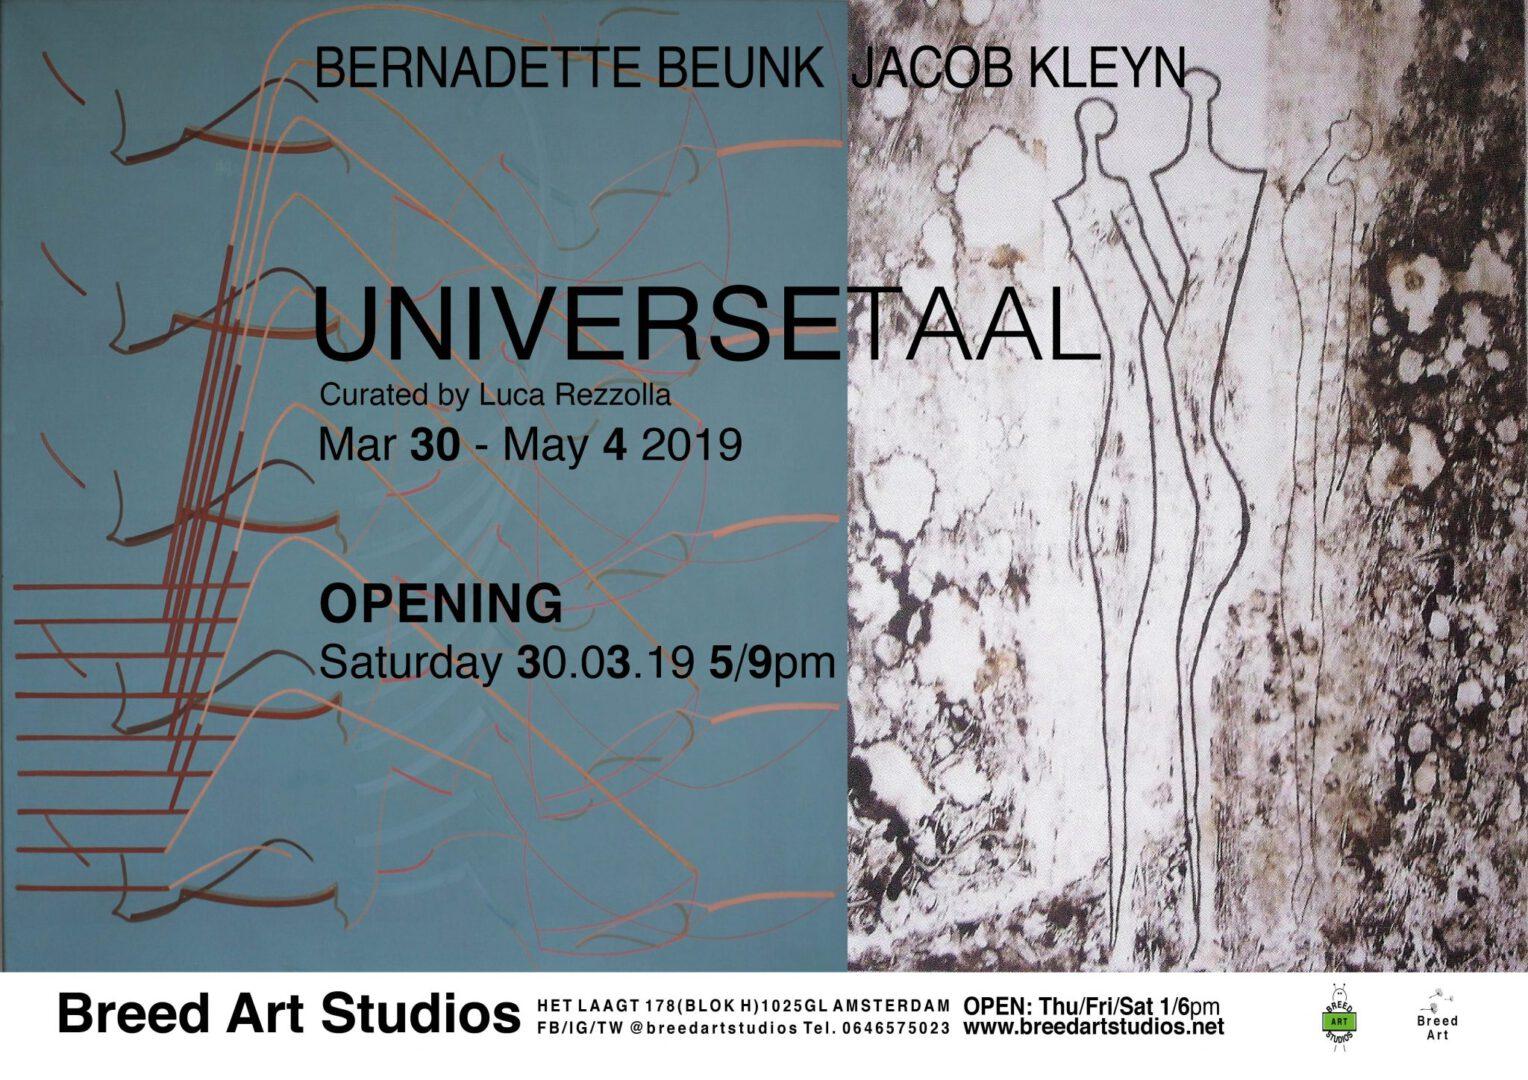 Bernadette Beunk - Jacob Kleyn UNIVERSETAAL at Breed Art Studios